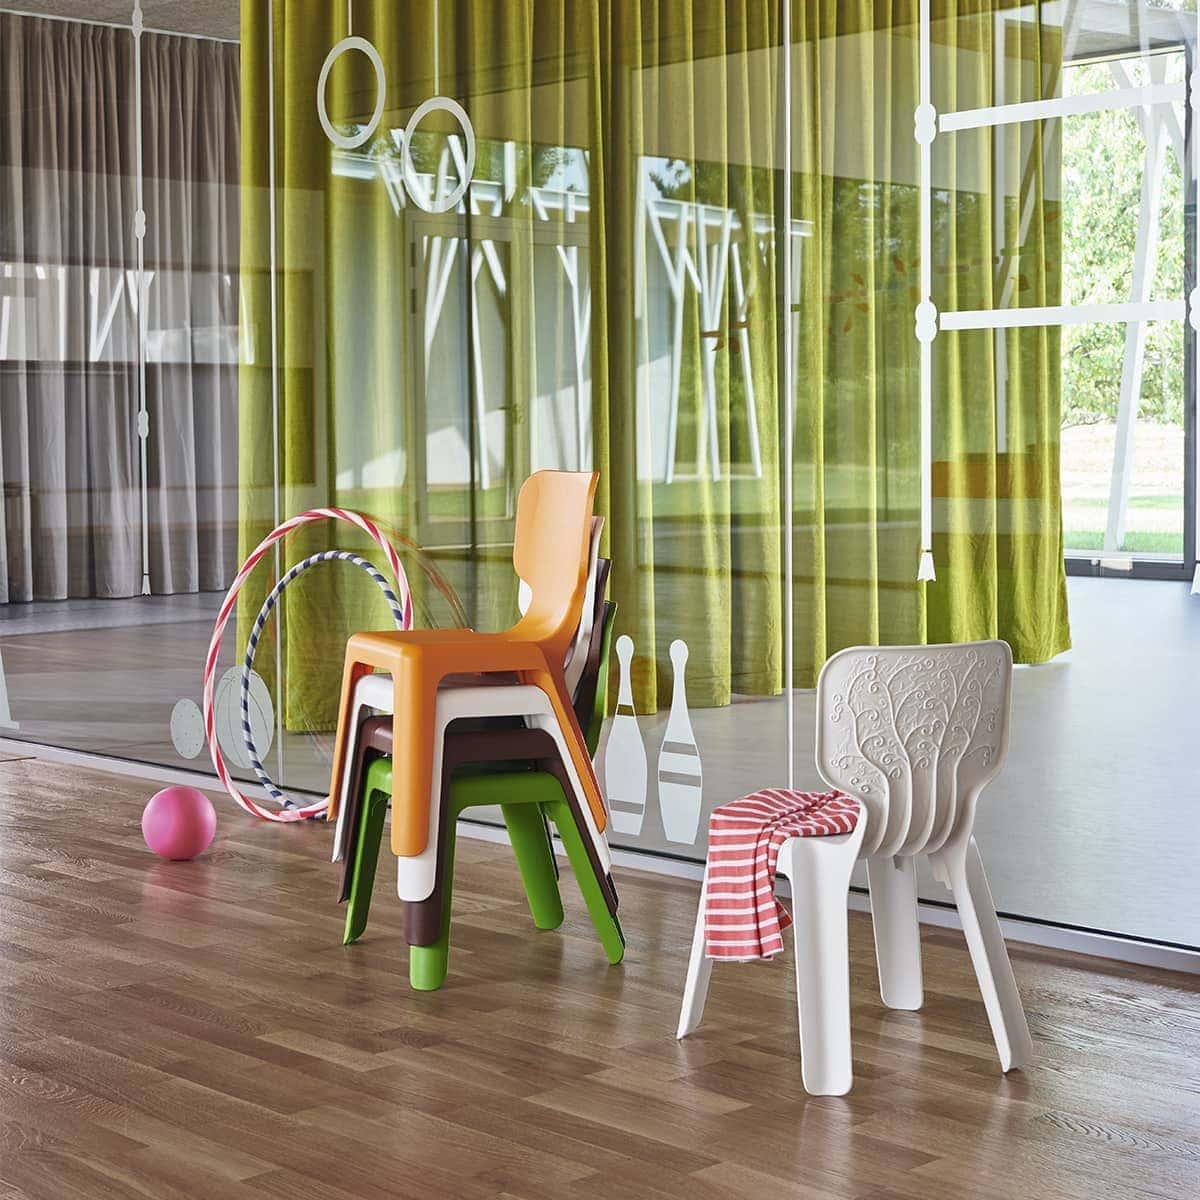 Cadeira Alma Magis® Original &Bull; Cadeira Infantil Empilhável - 7 &Bull; Deezign